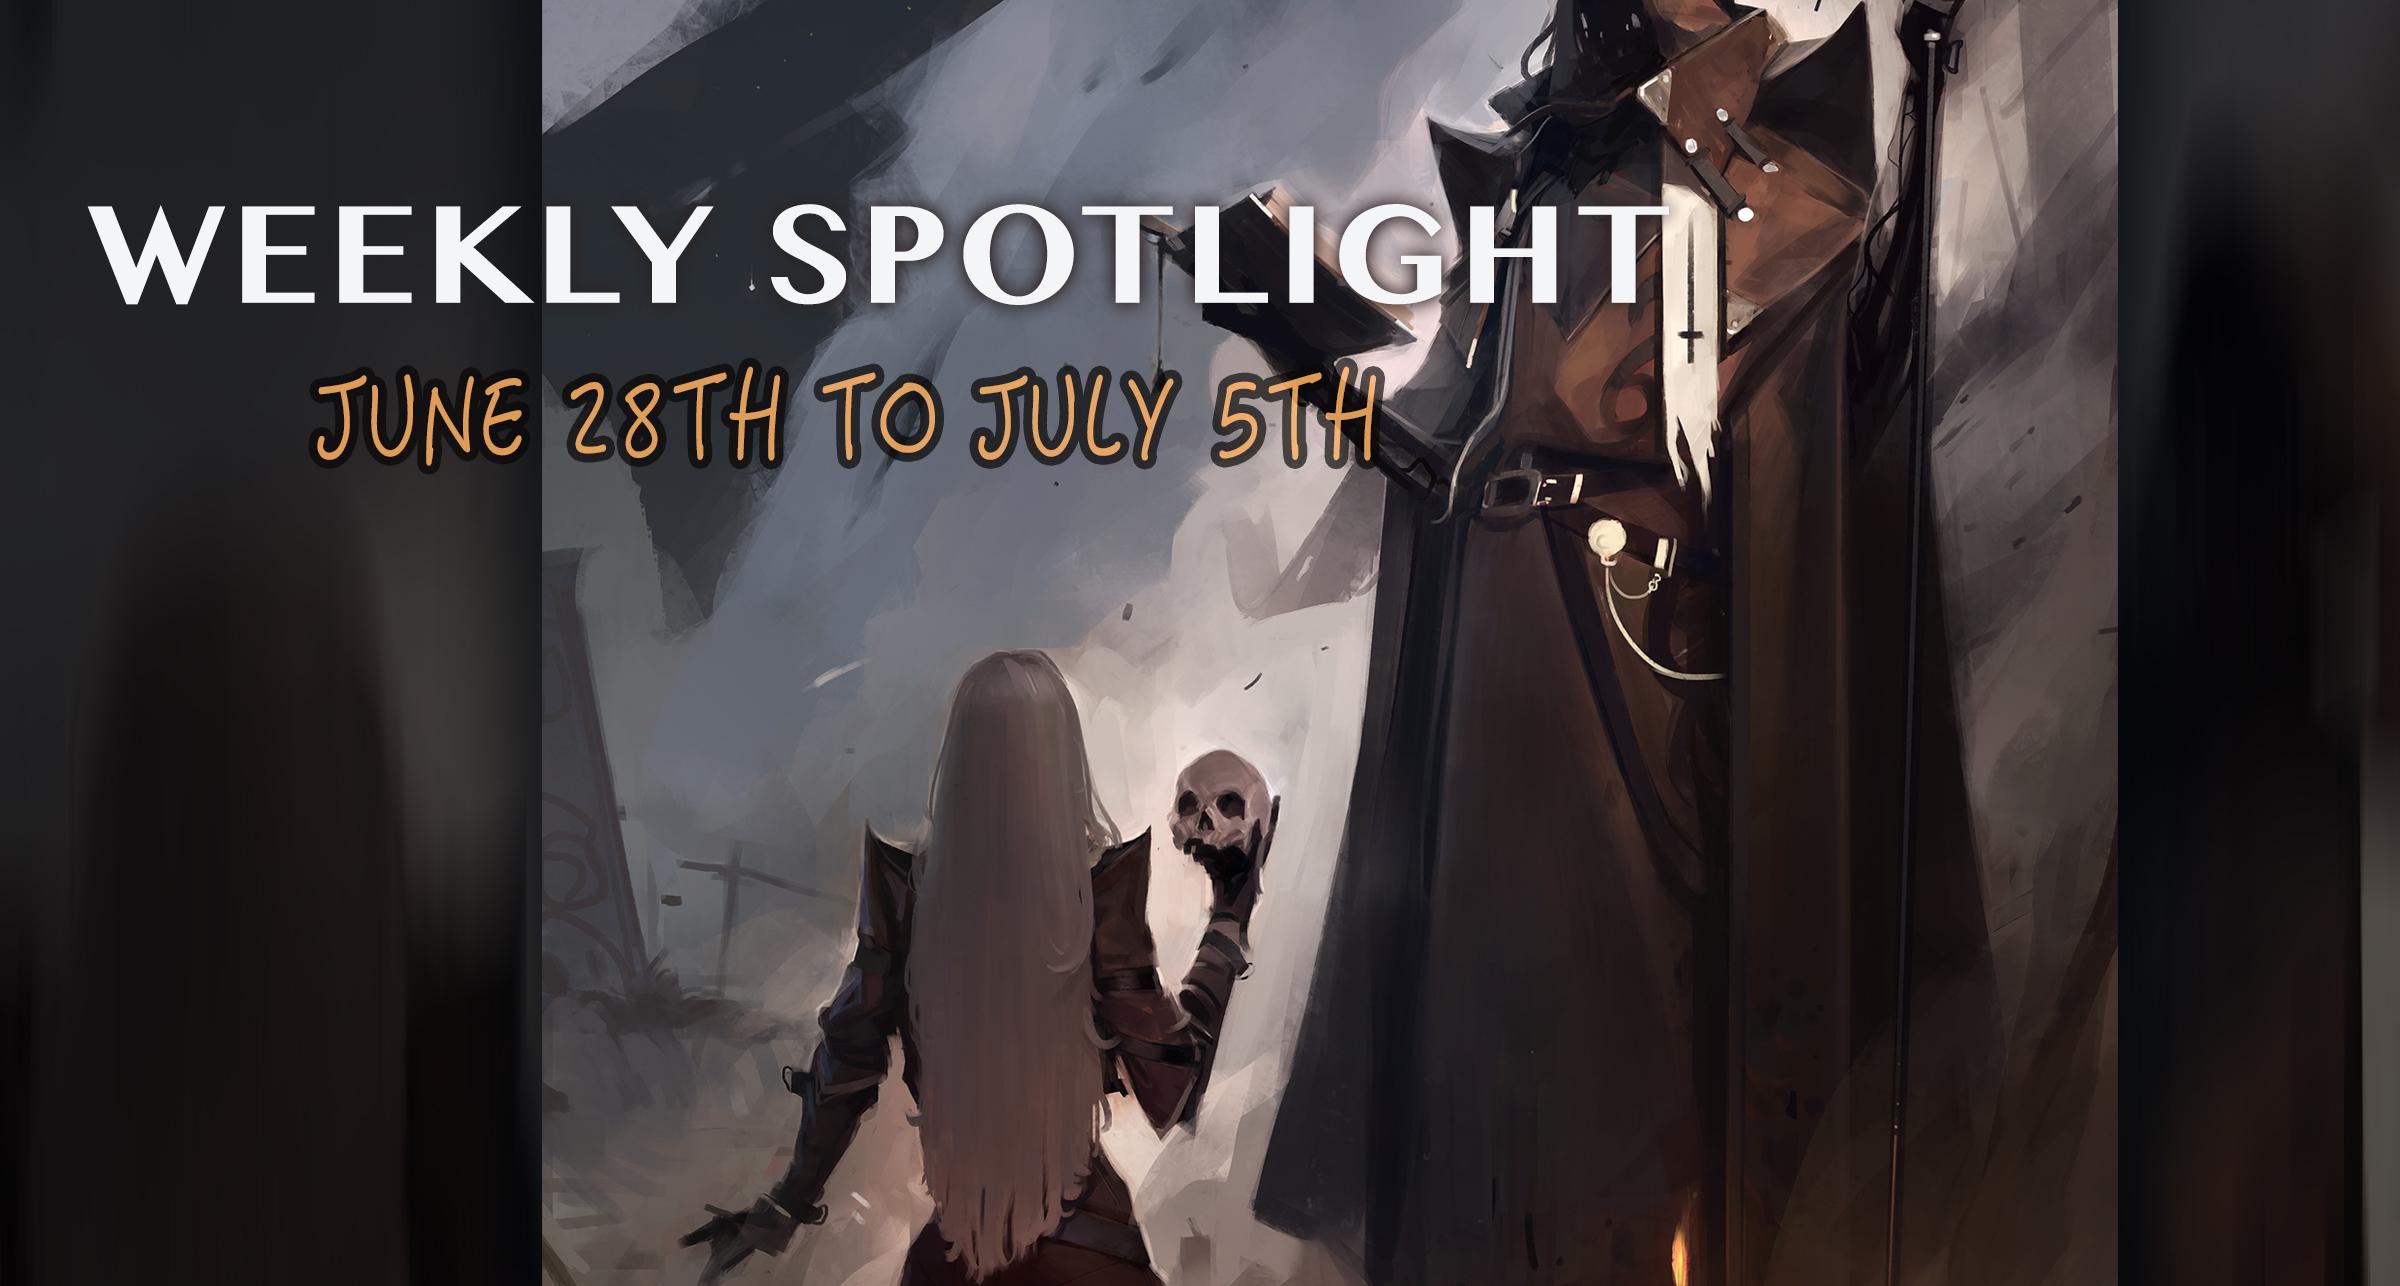 weekly-spotlight -june28-july5